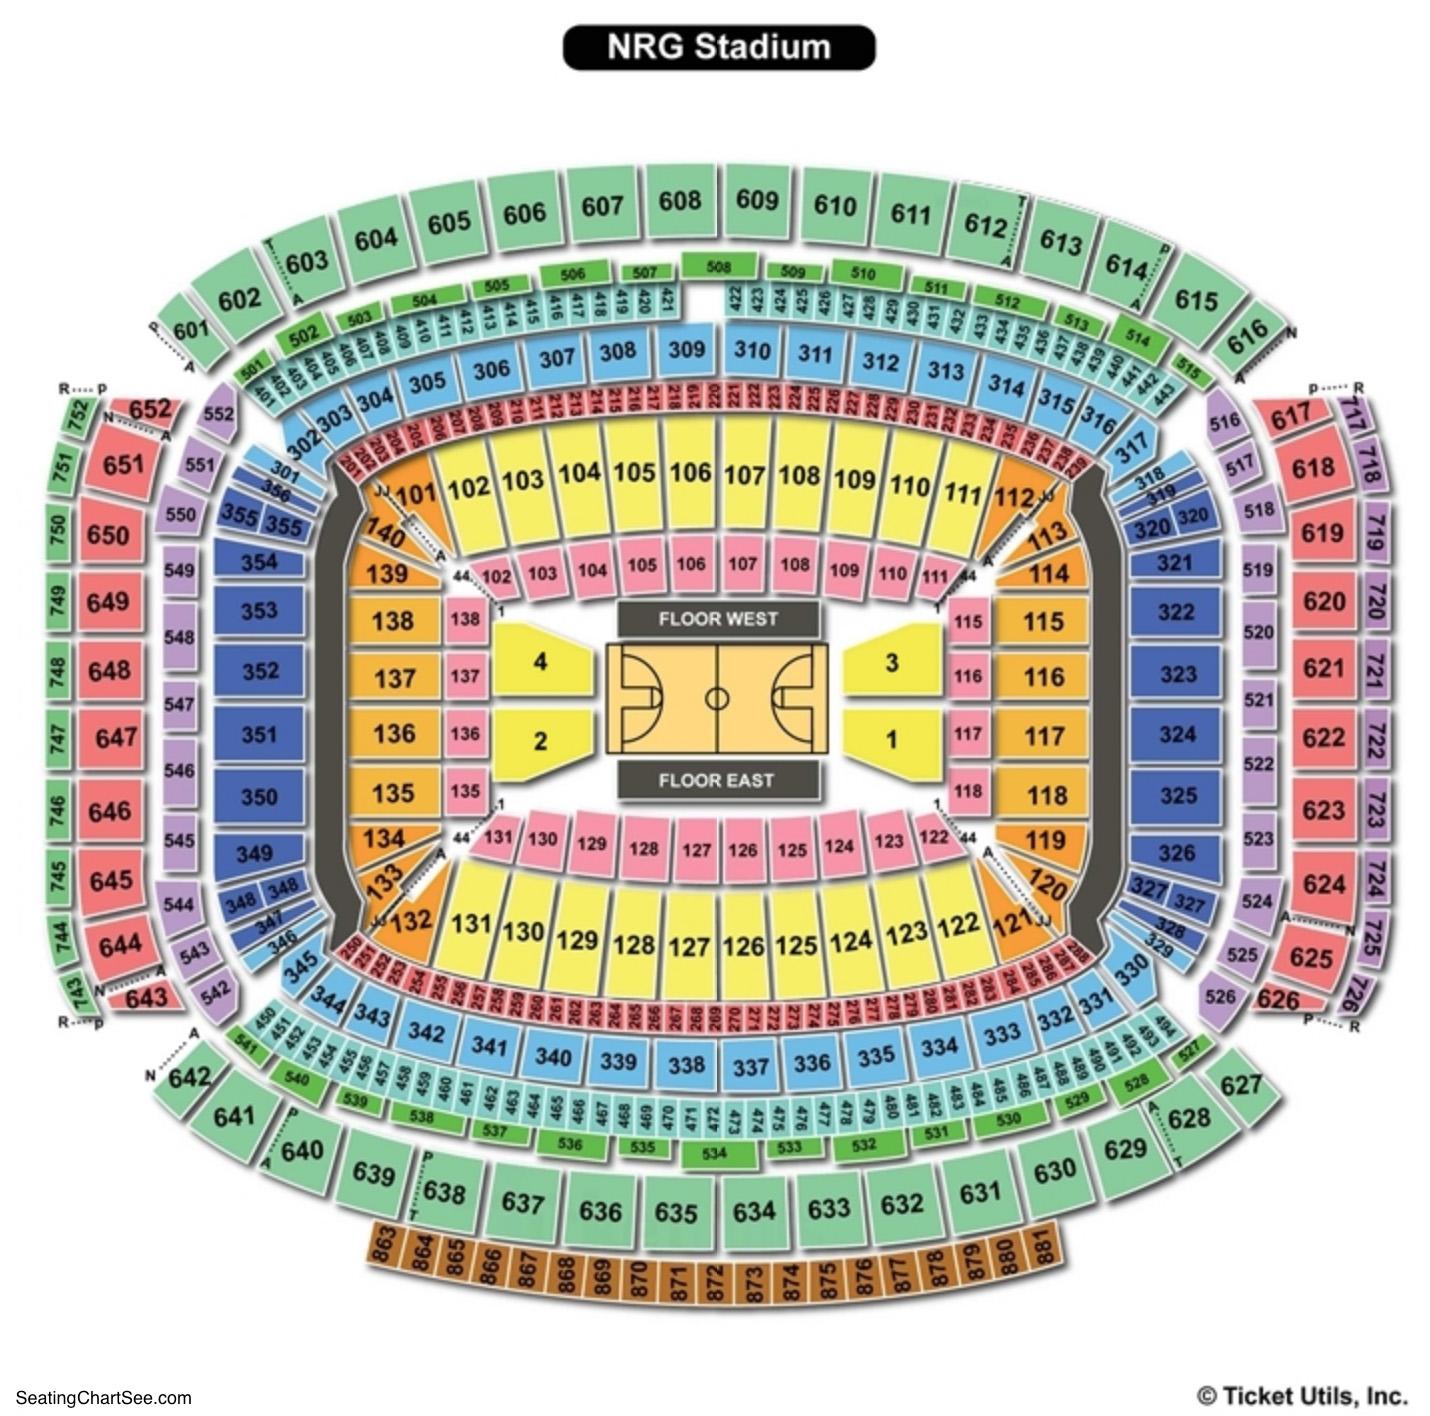 NRG Stadium Basketball Seating Chart